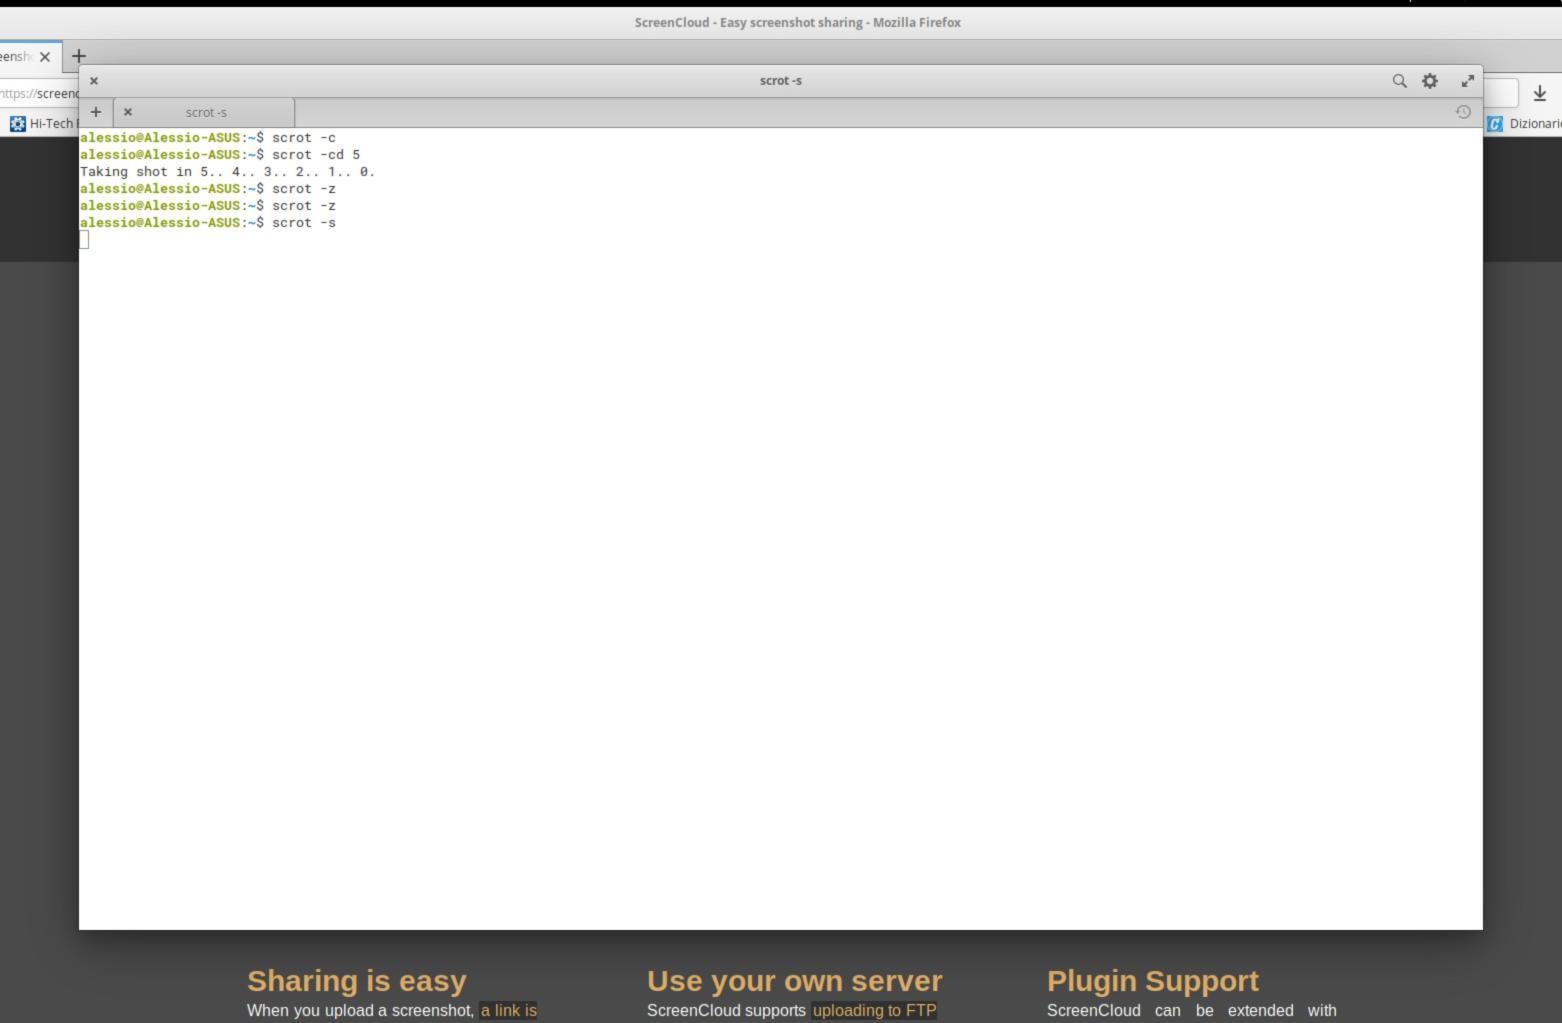 Come catturare screenshot da terminale Linux con Scrot 2